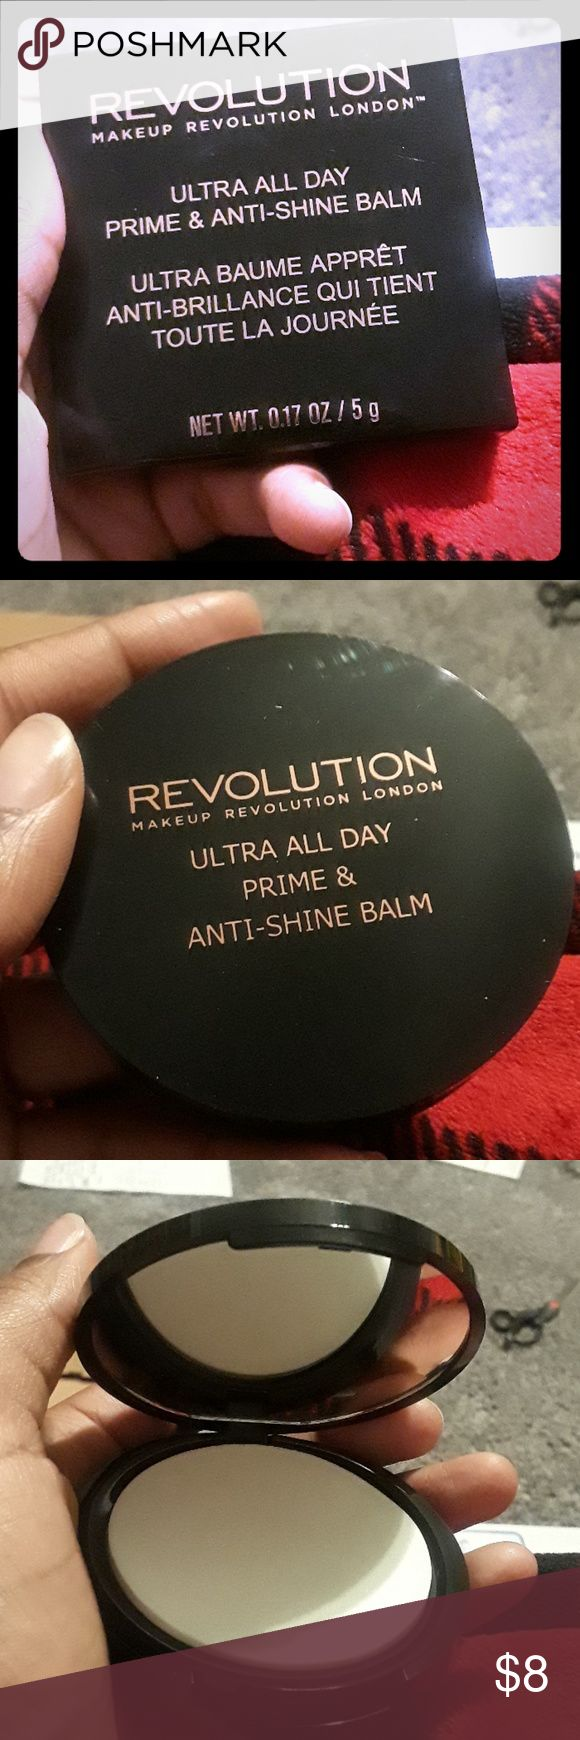 Revolution antishine balm Ultra all day prime and anti